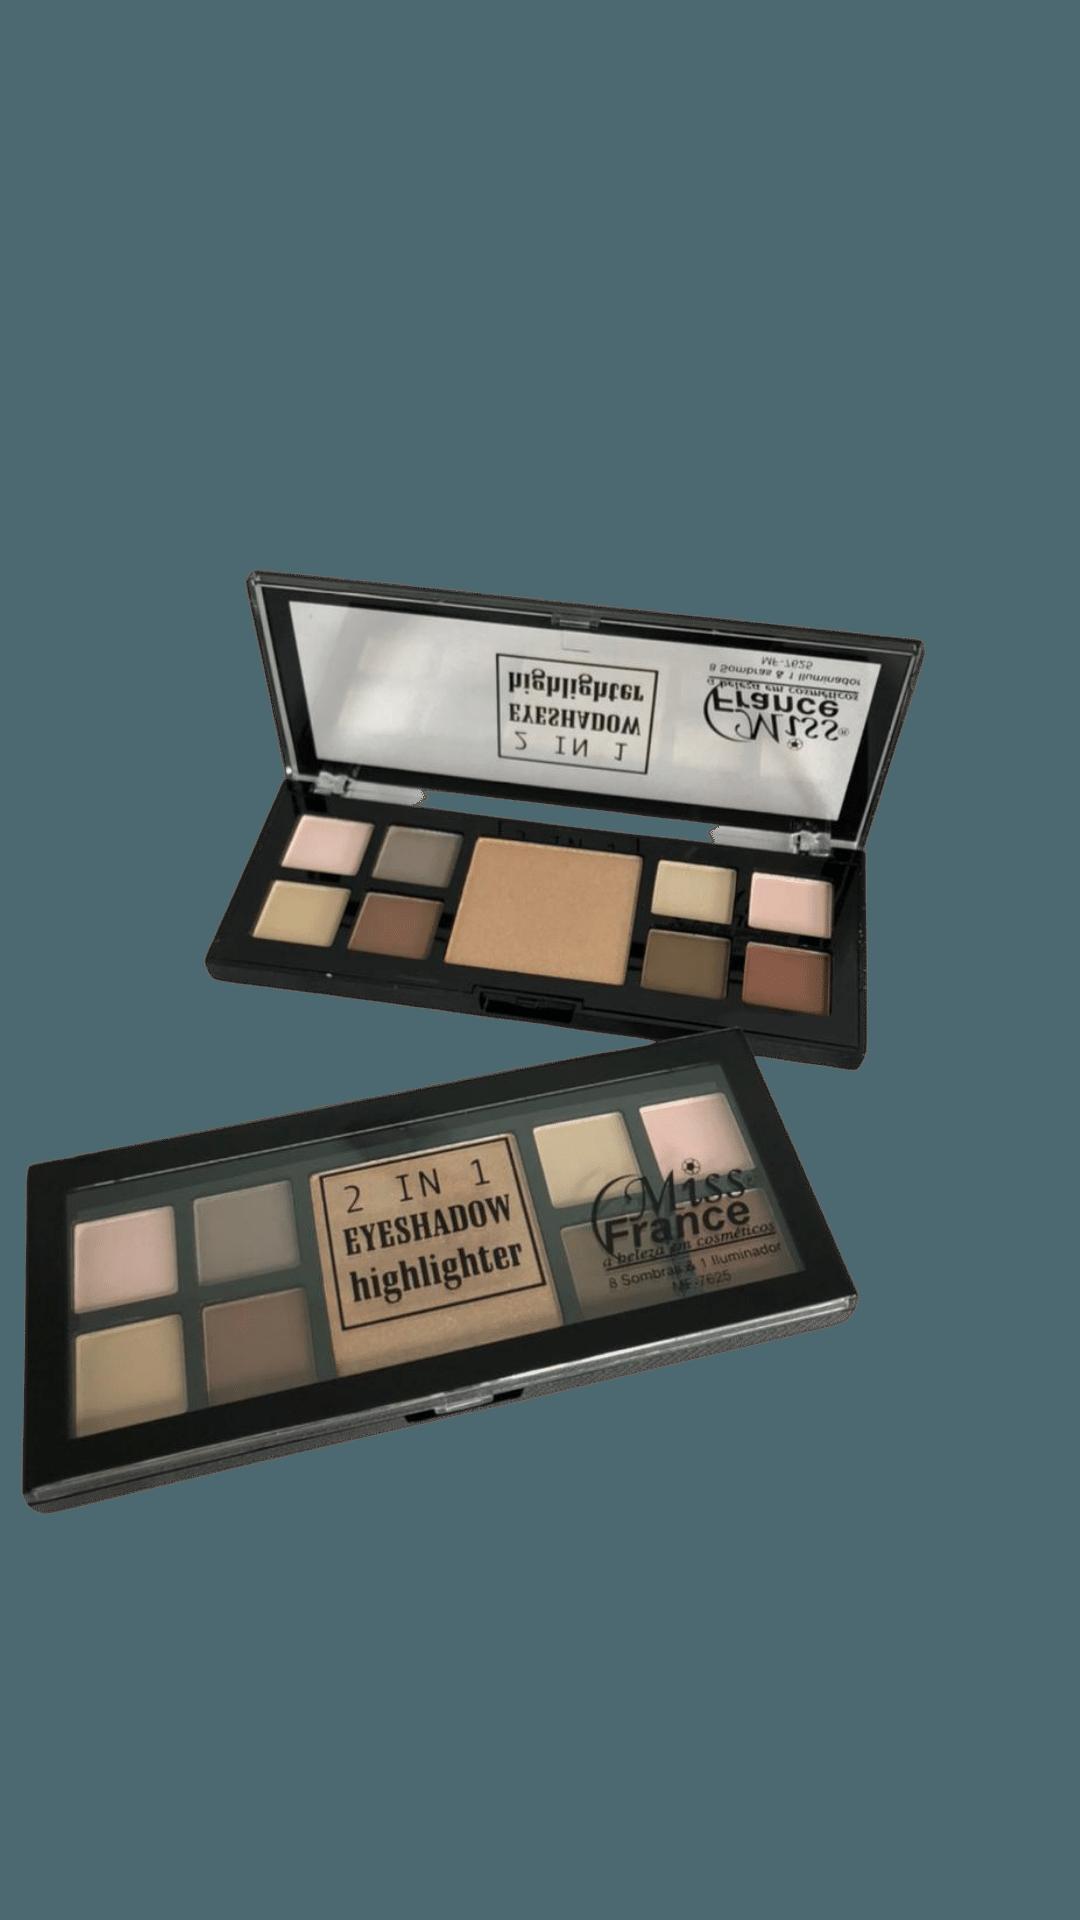 Paleta de Sombras 2 IN 1 Eyeshadow Highlighter C3 - Miss France (MF7625C)